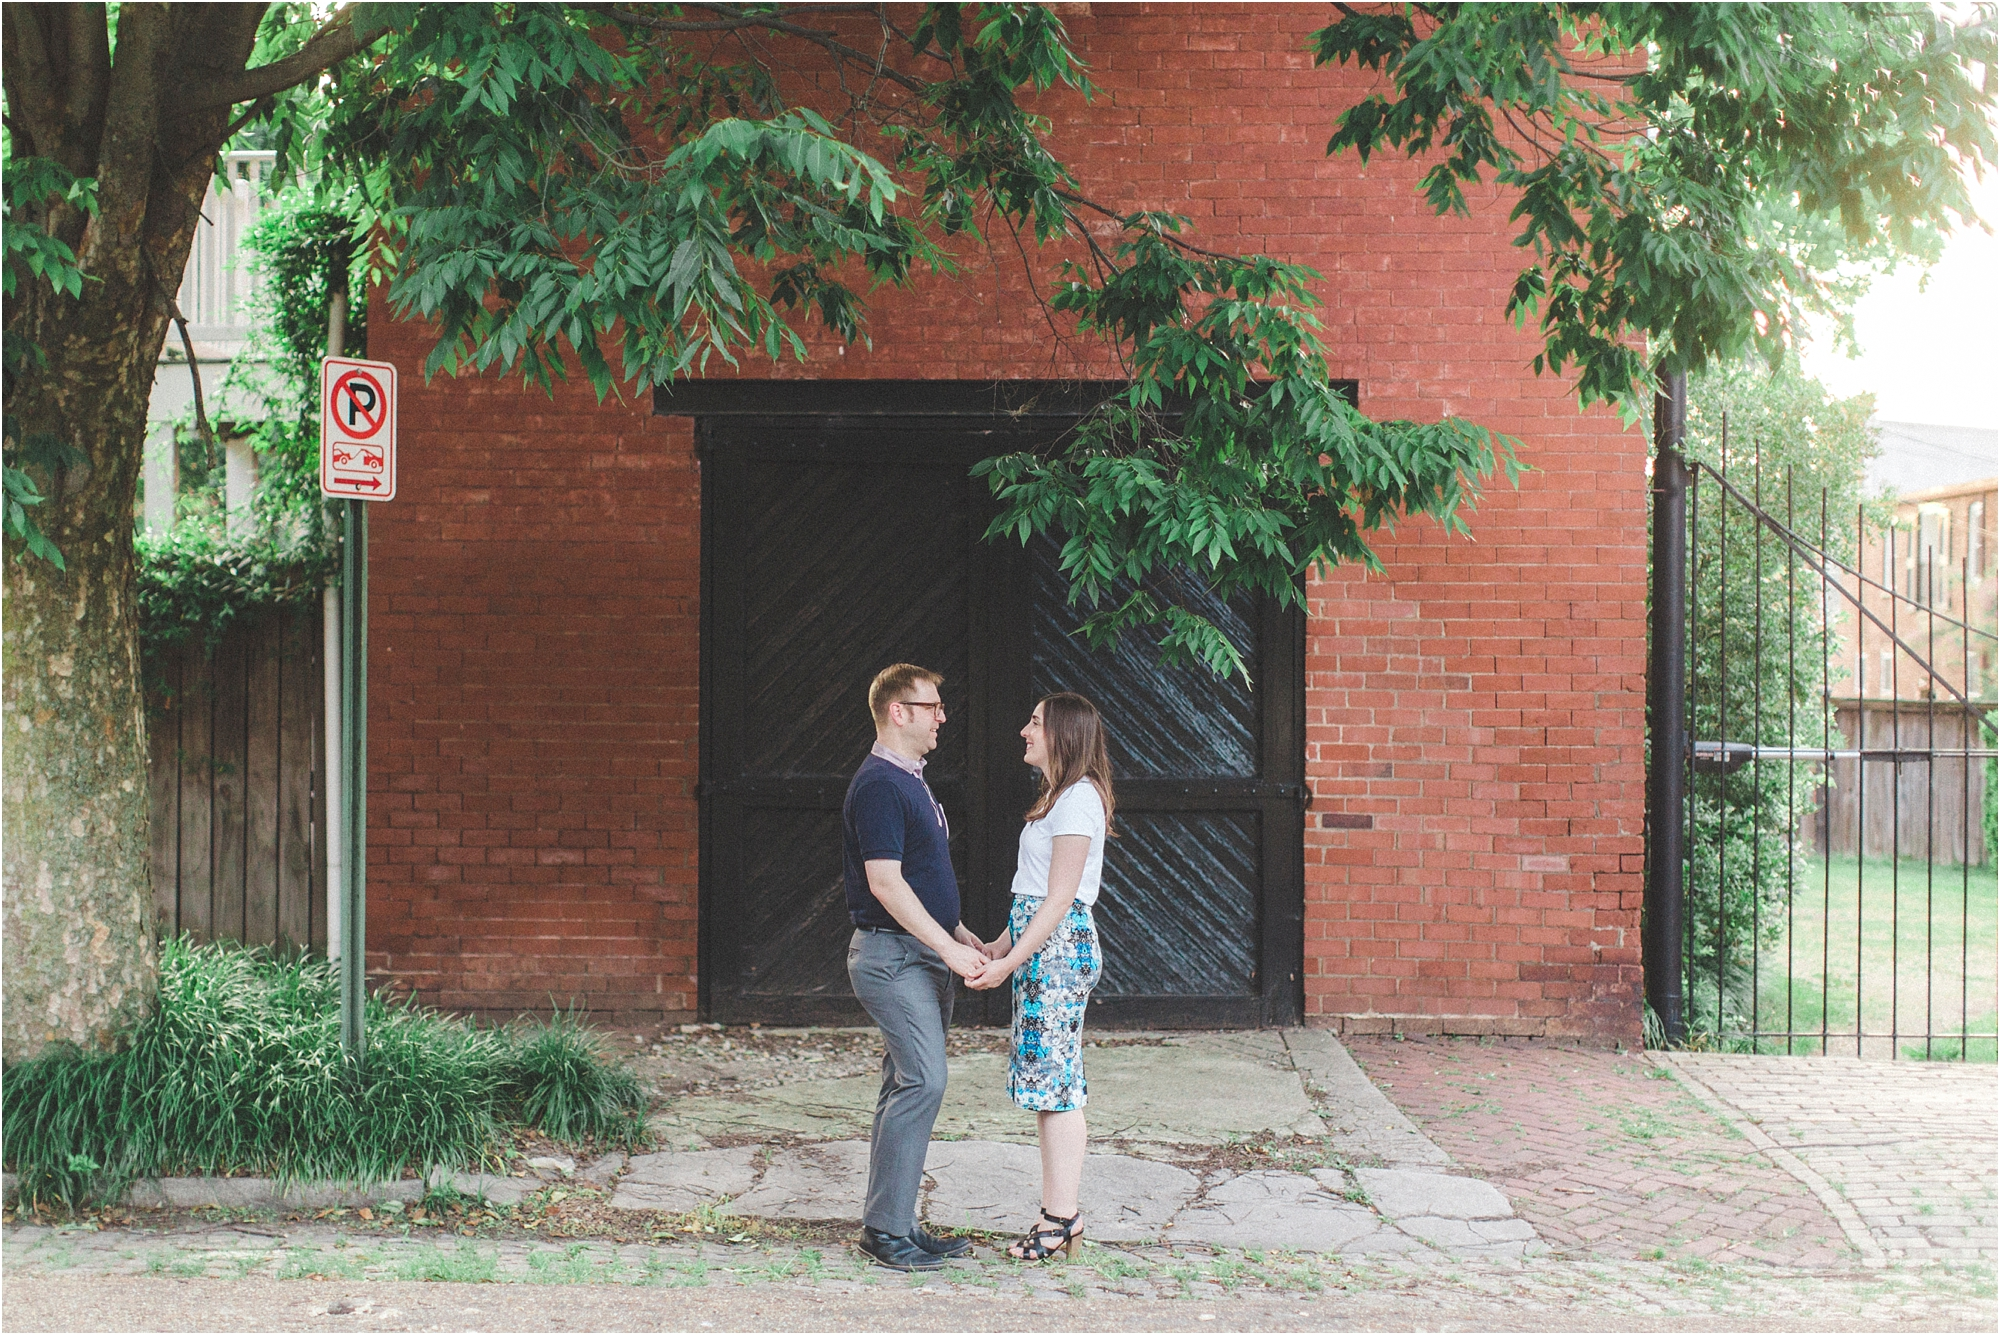 stephanie-yonce-photography-abby-matt-church-hill-engagement-photos_0009.jpg